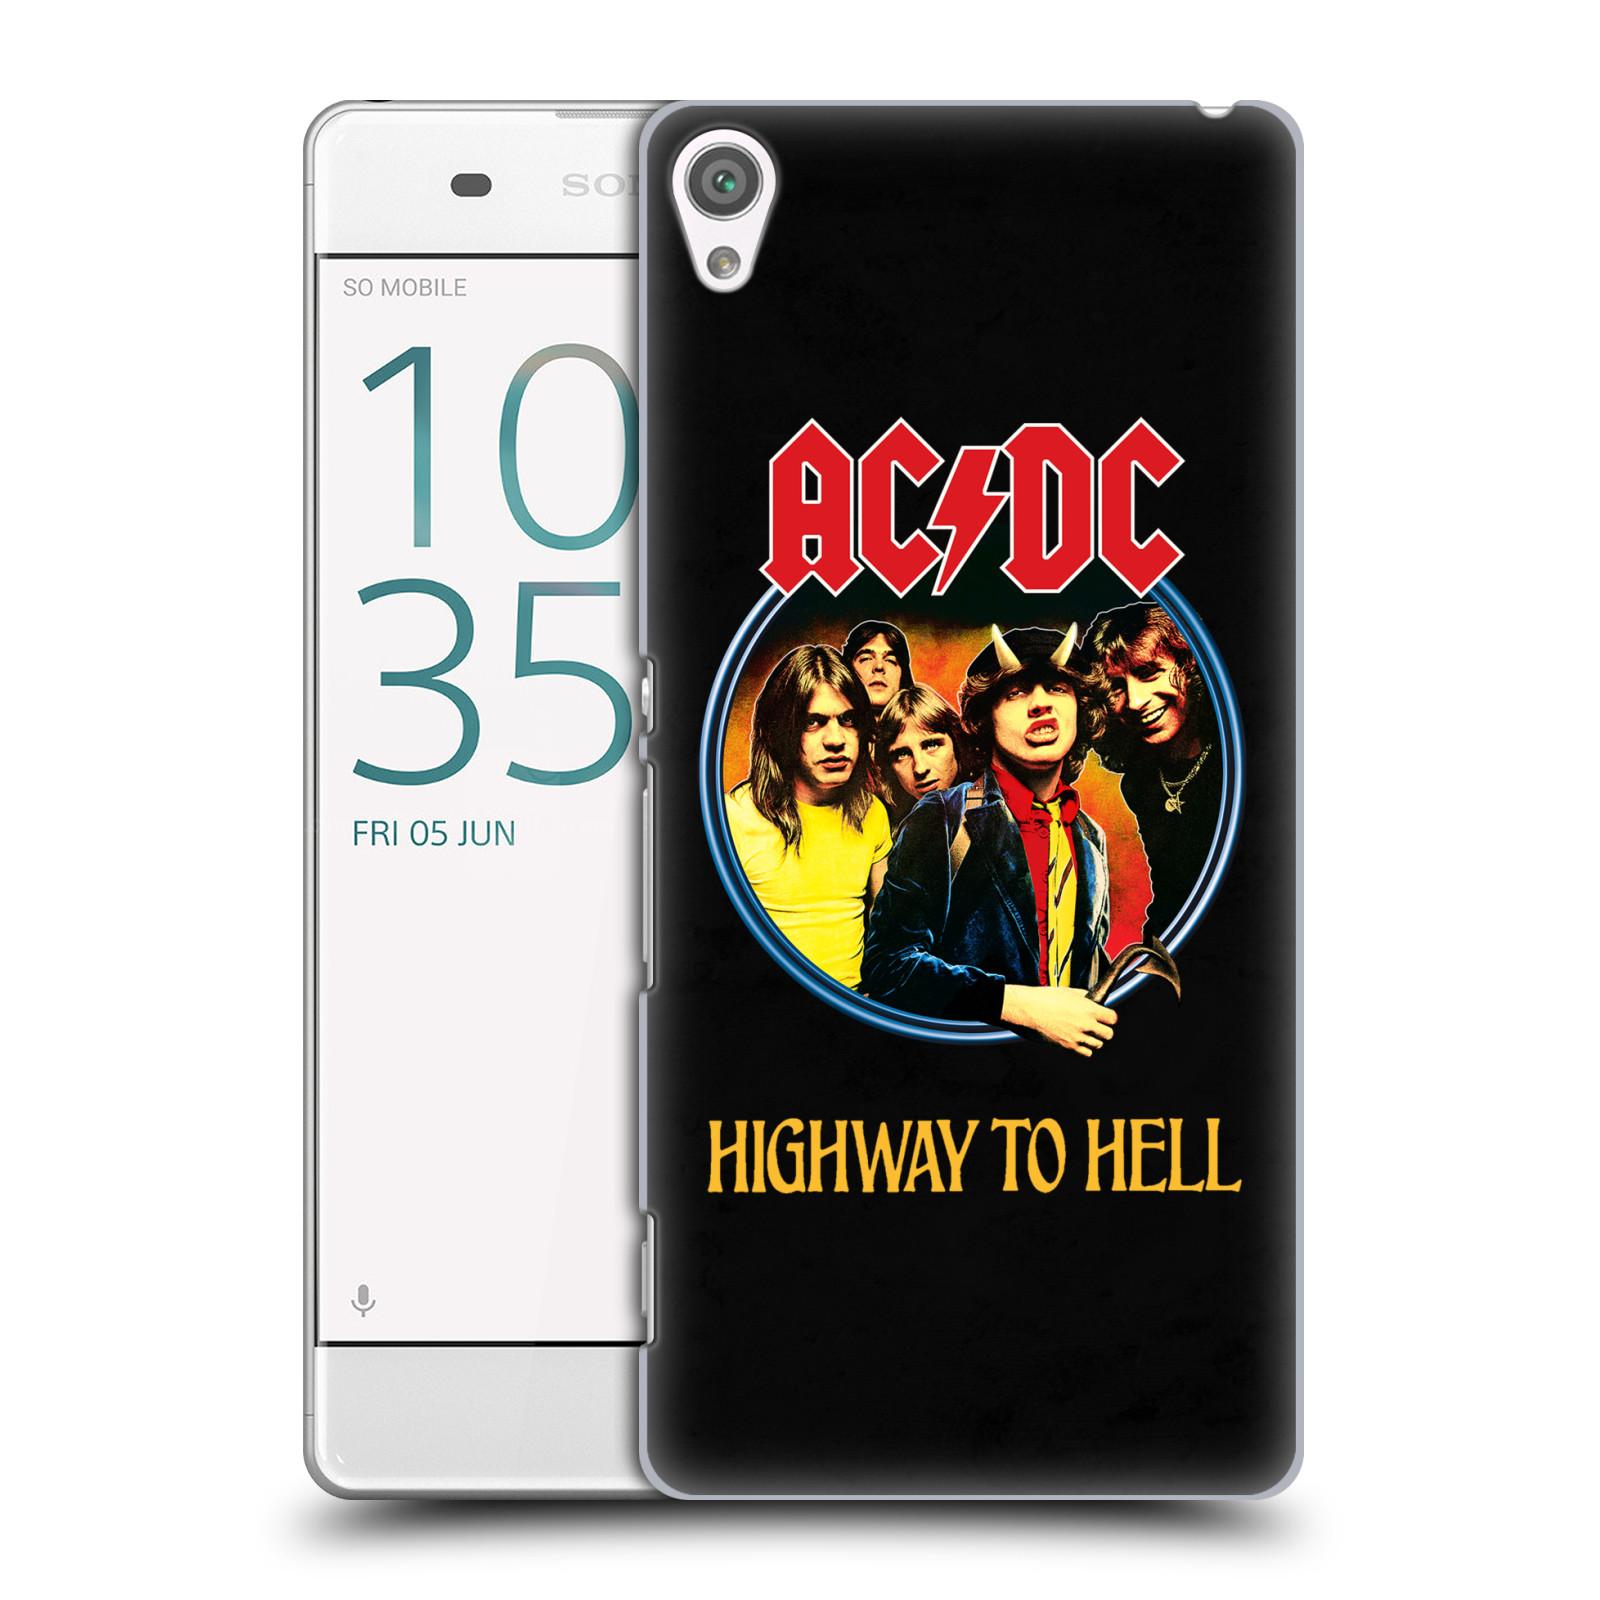 Plastové pouzdro na mobil Sony Xperia XA HEAD CASE AC/DC Highway to Hell (Plastový kryt či obal na mobilní telefon s oficiálním motivem australské skupiny AC/DC pro Sony Xperia XA F3111 / Dual F3112)